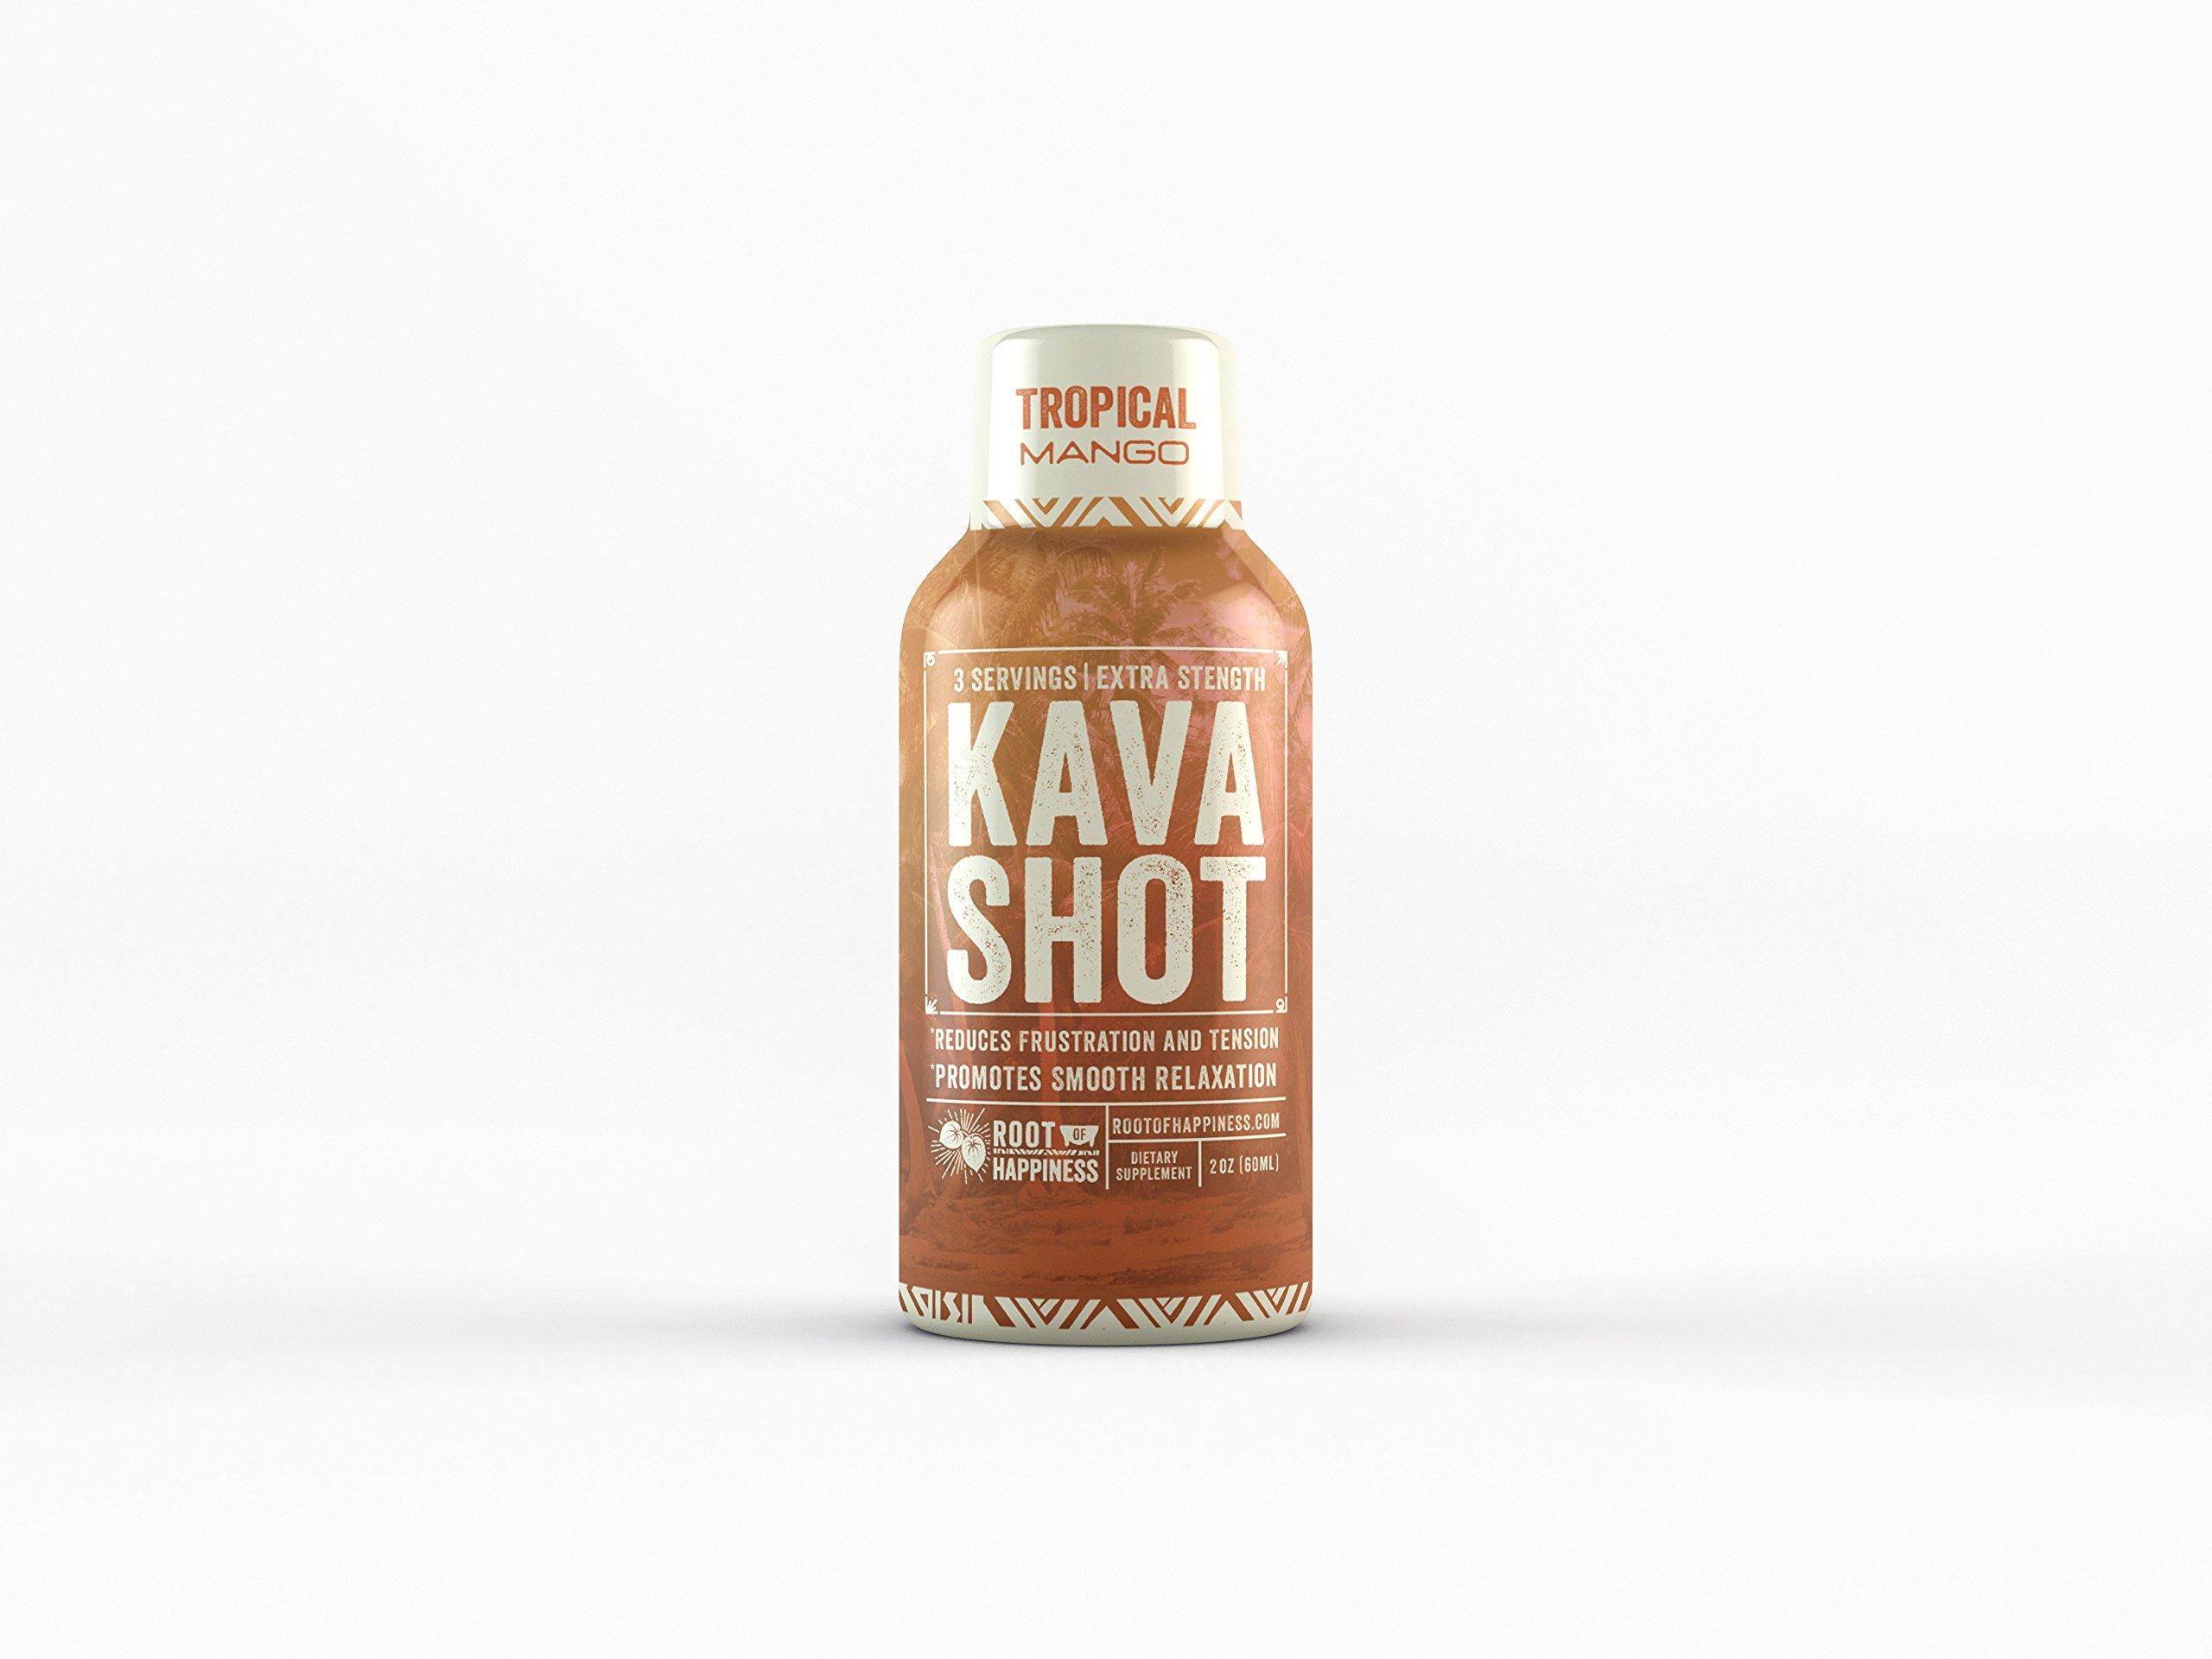 Kava Shot™ 2oz - Tropical Mango Flavor